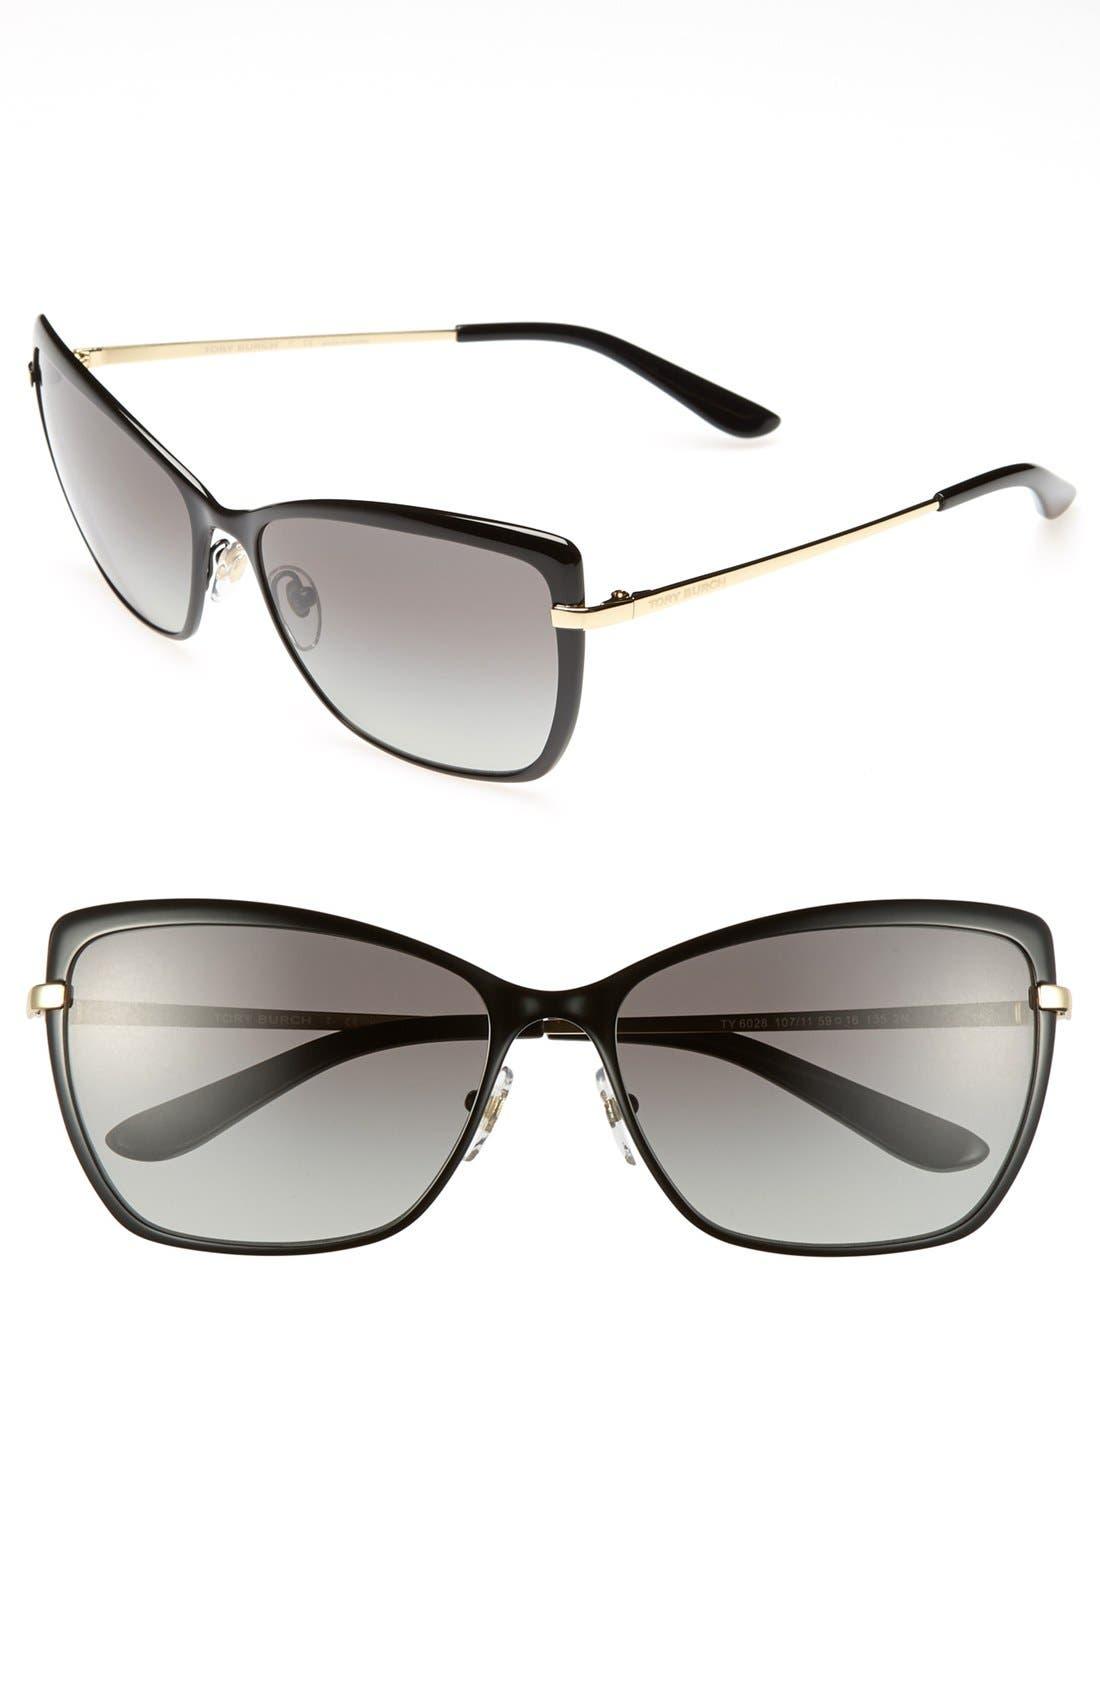 Alternate Image 1 Selected - Tory Burch 59mm Retro Sunglasses